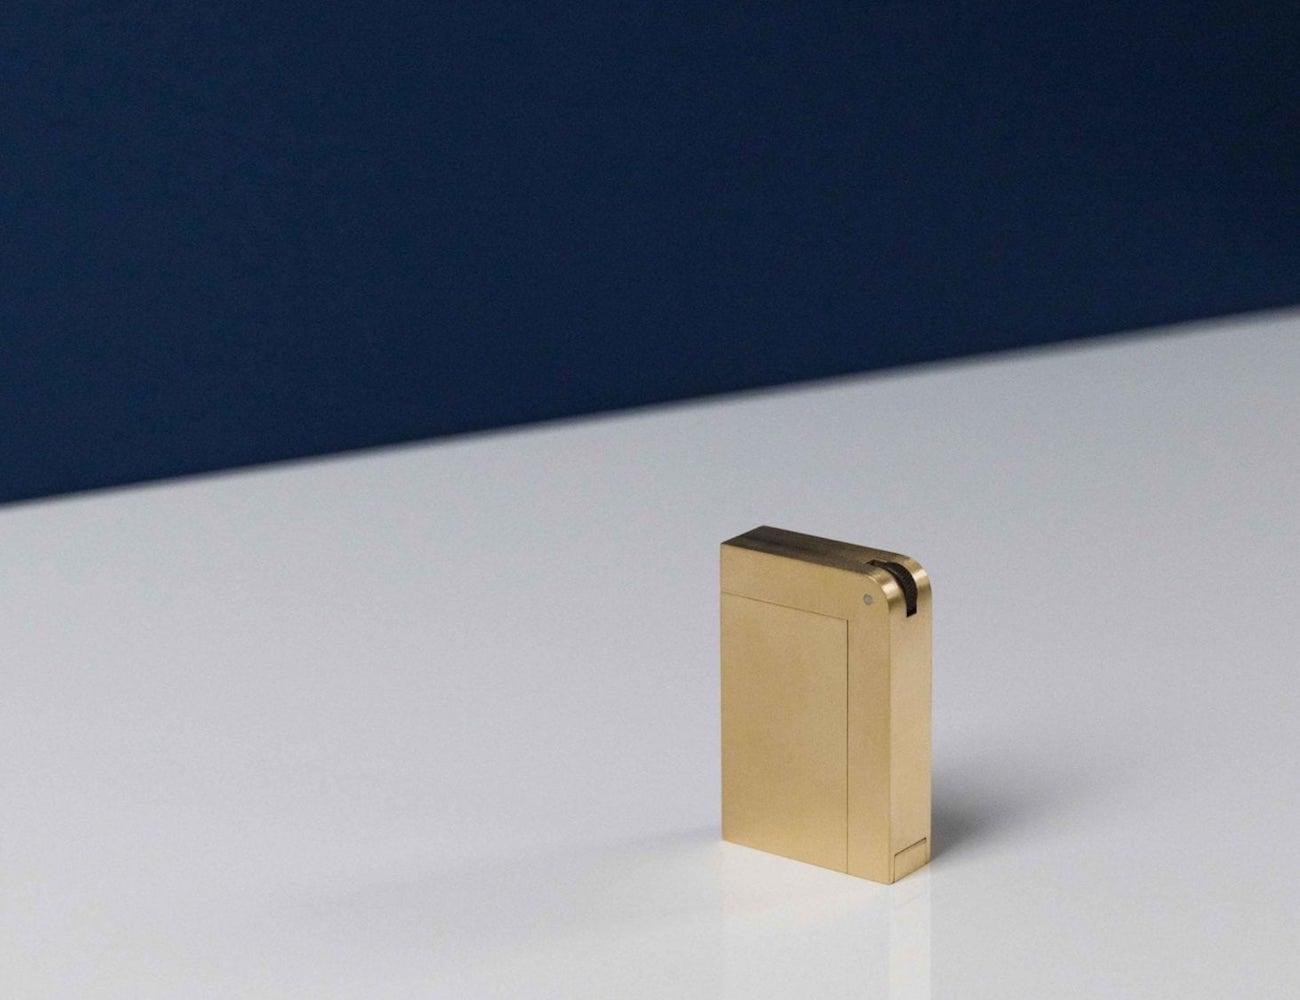 KNNOX Luxury Brass Lighter